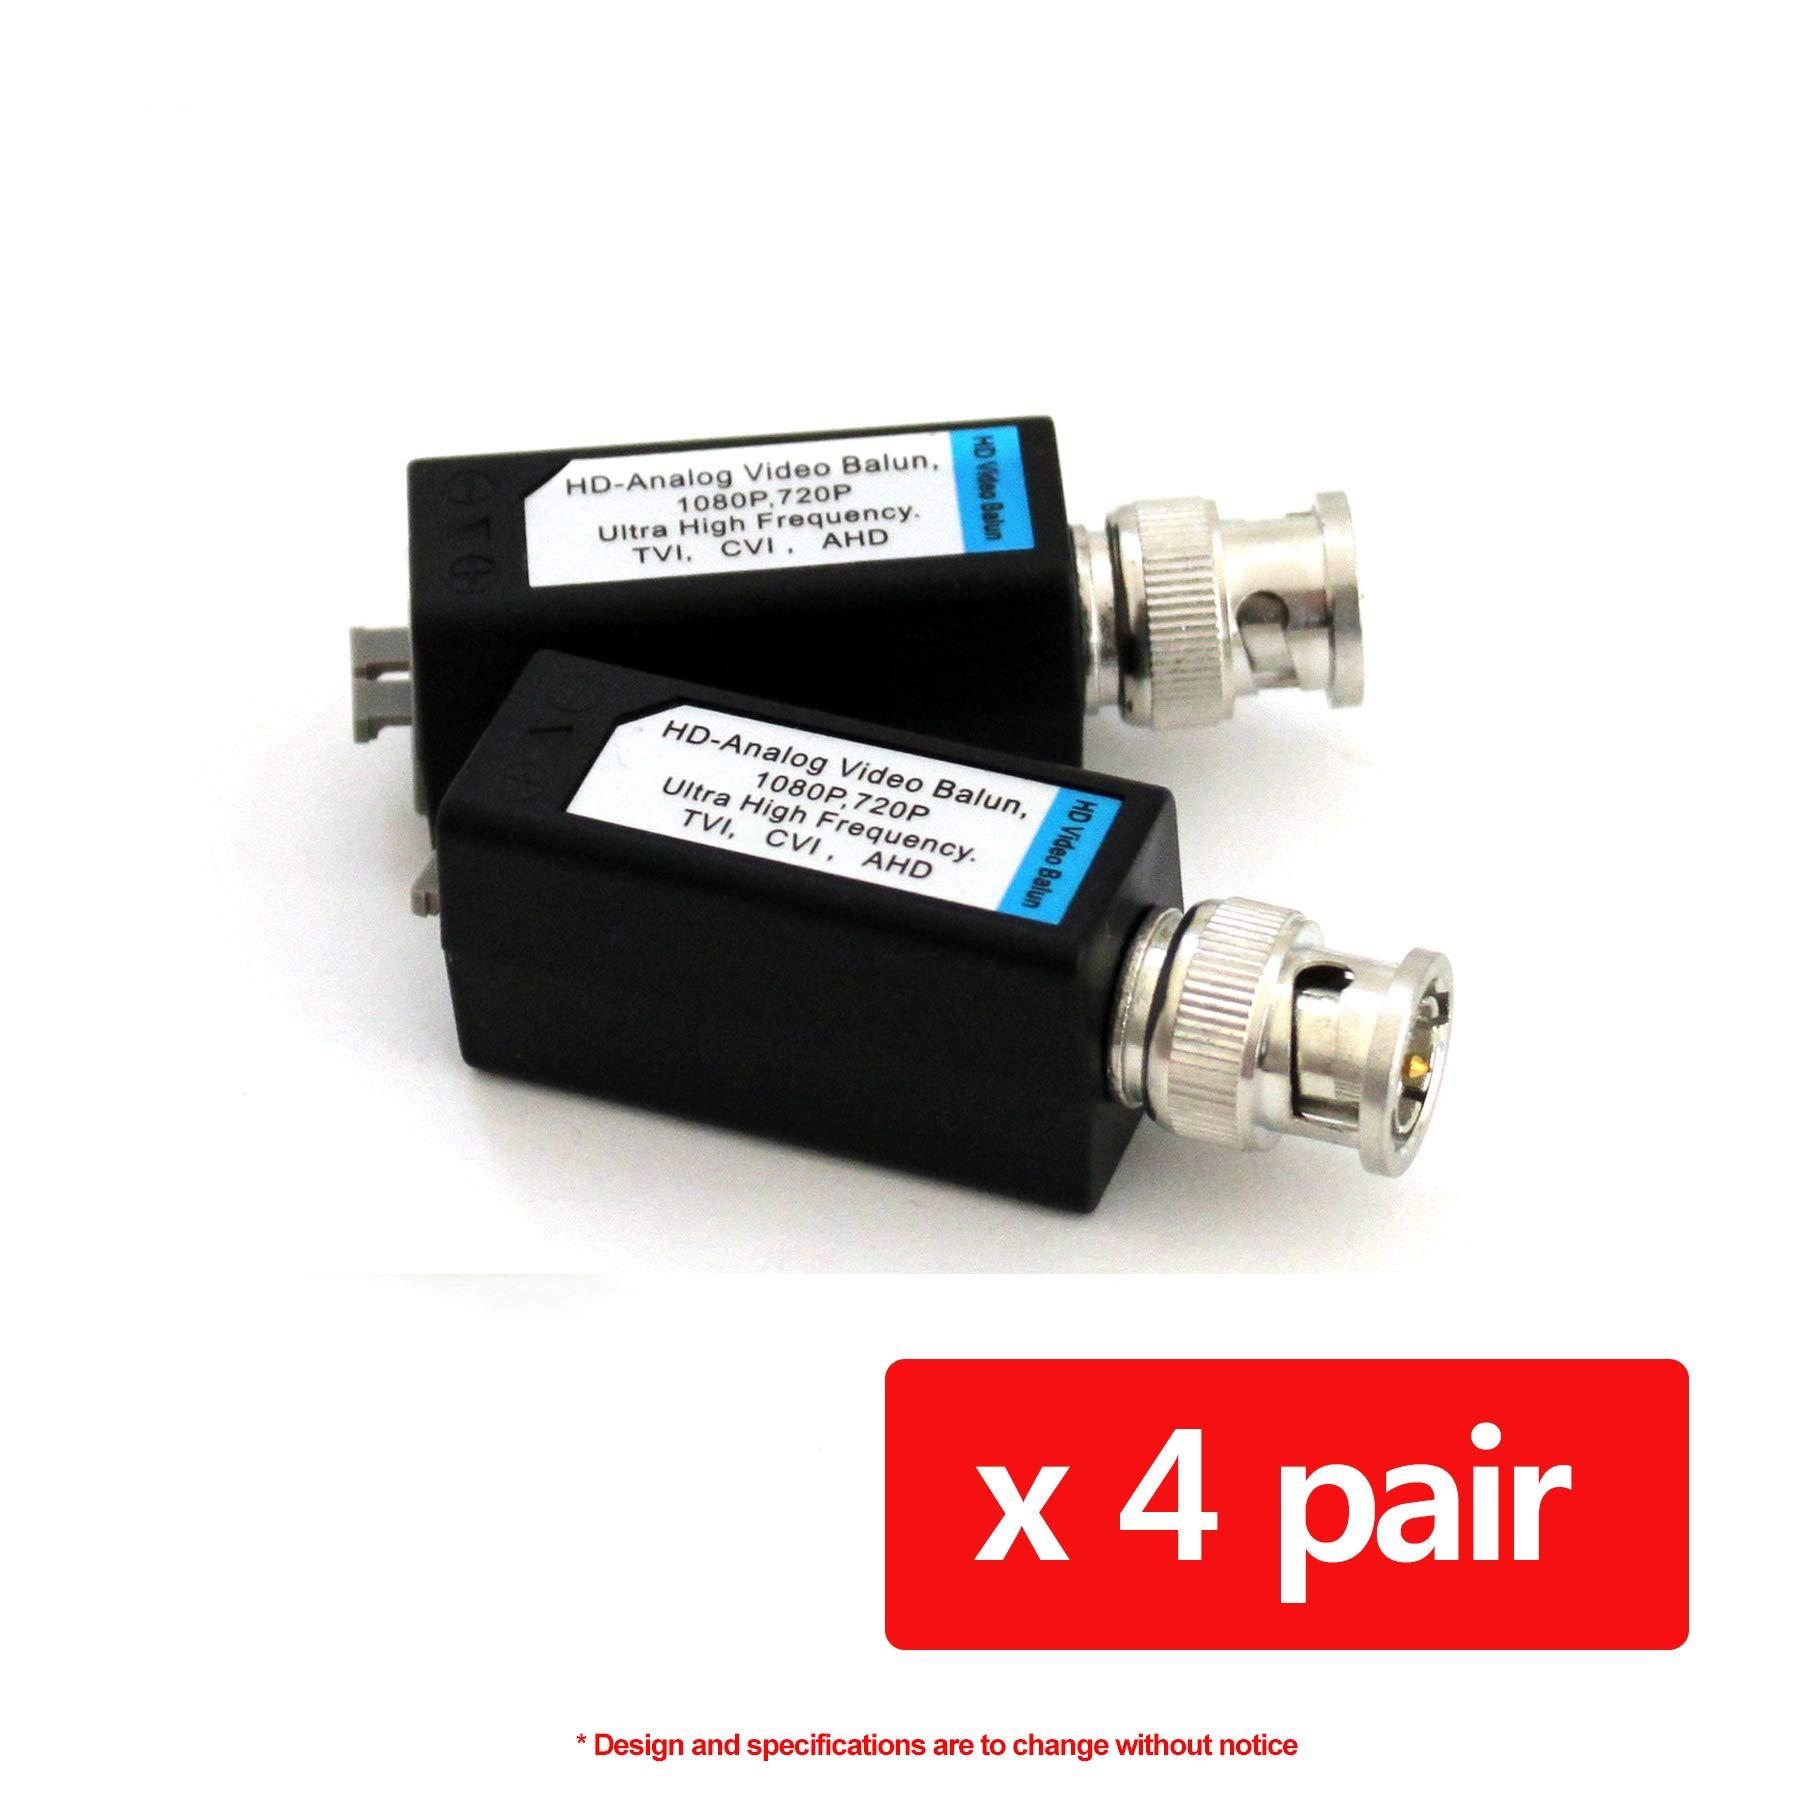 HDVD 4 Pairs Mini CCTV BNC Video Balun Transceiver Cable Push Button Terminal (4 Pairs)